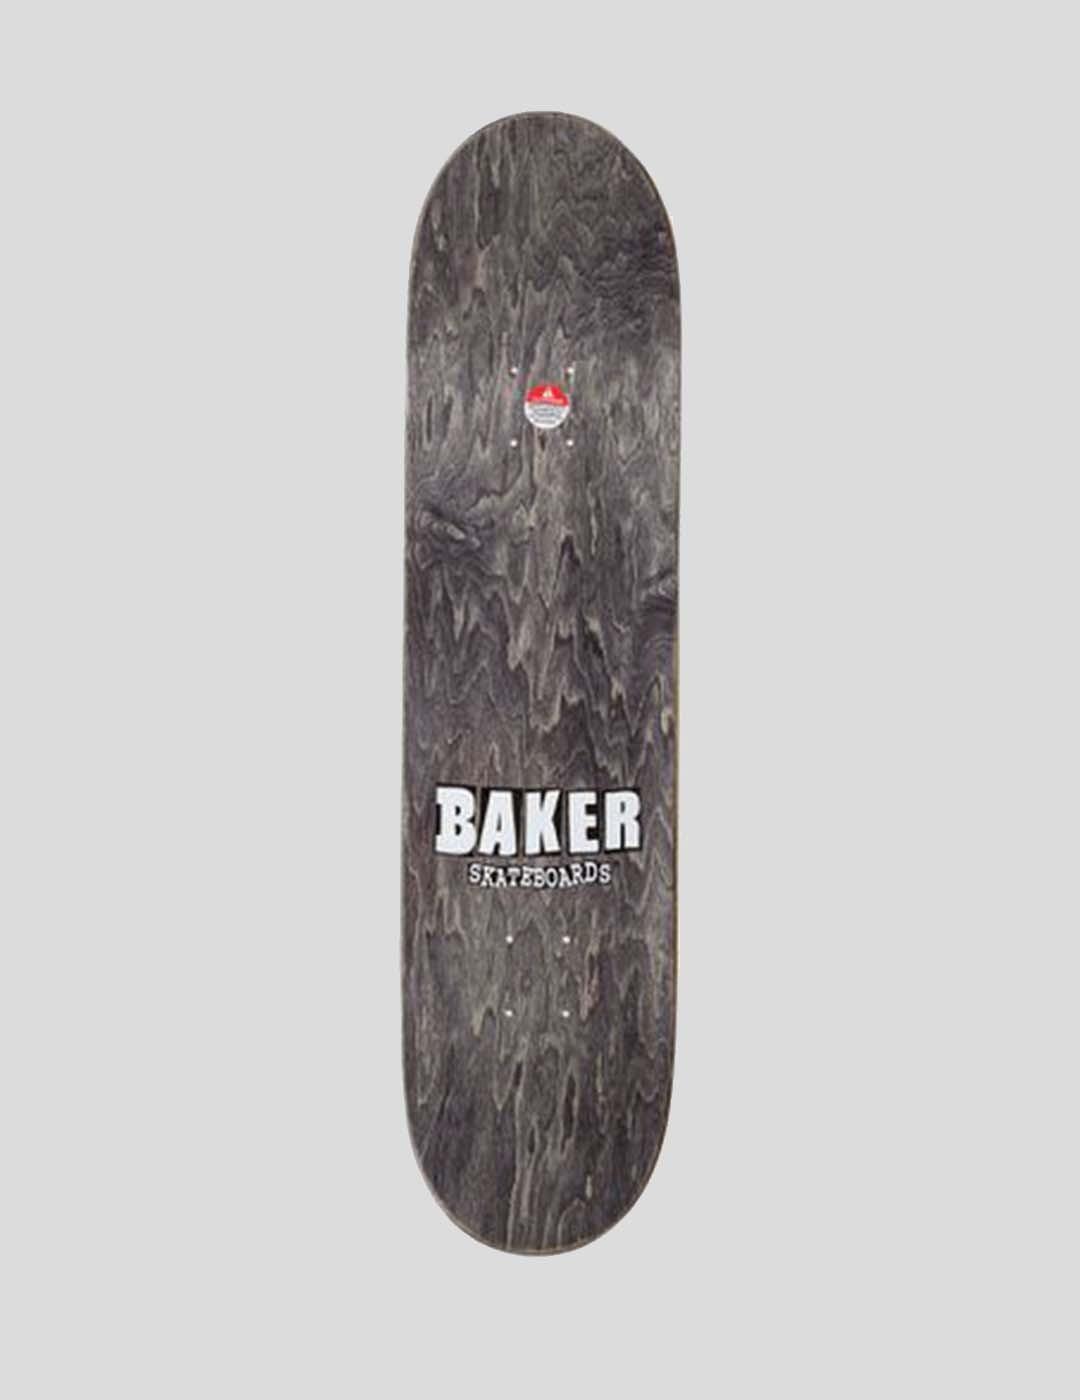 TABLA BAKER BRAND LOGO RED WHITE DECK